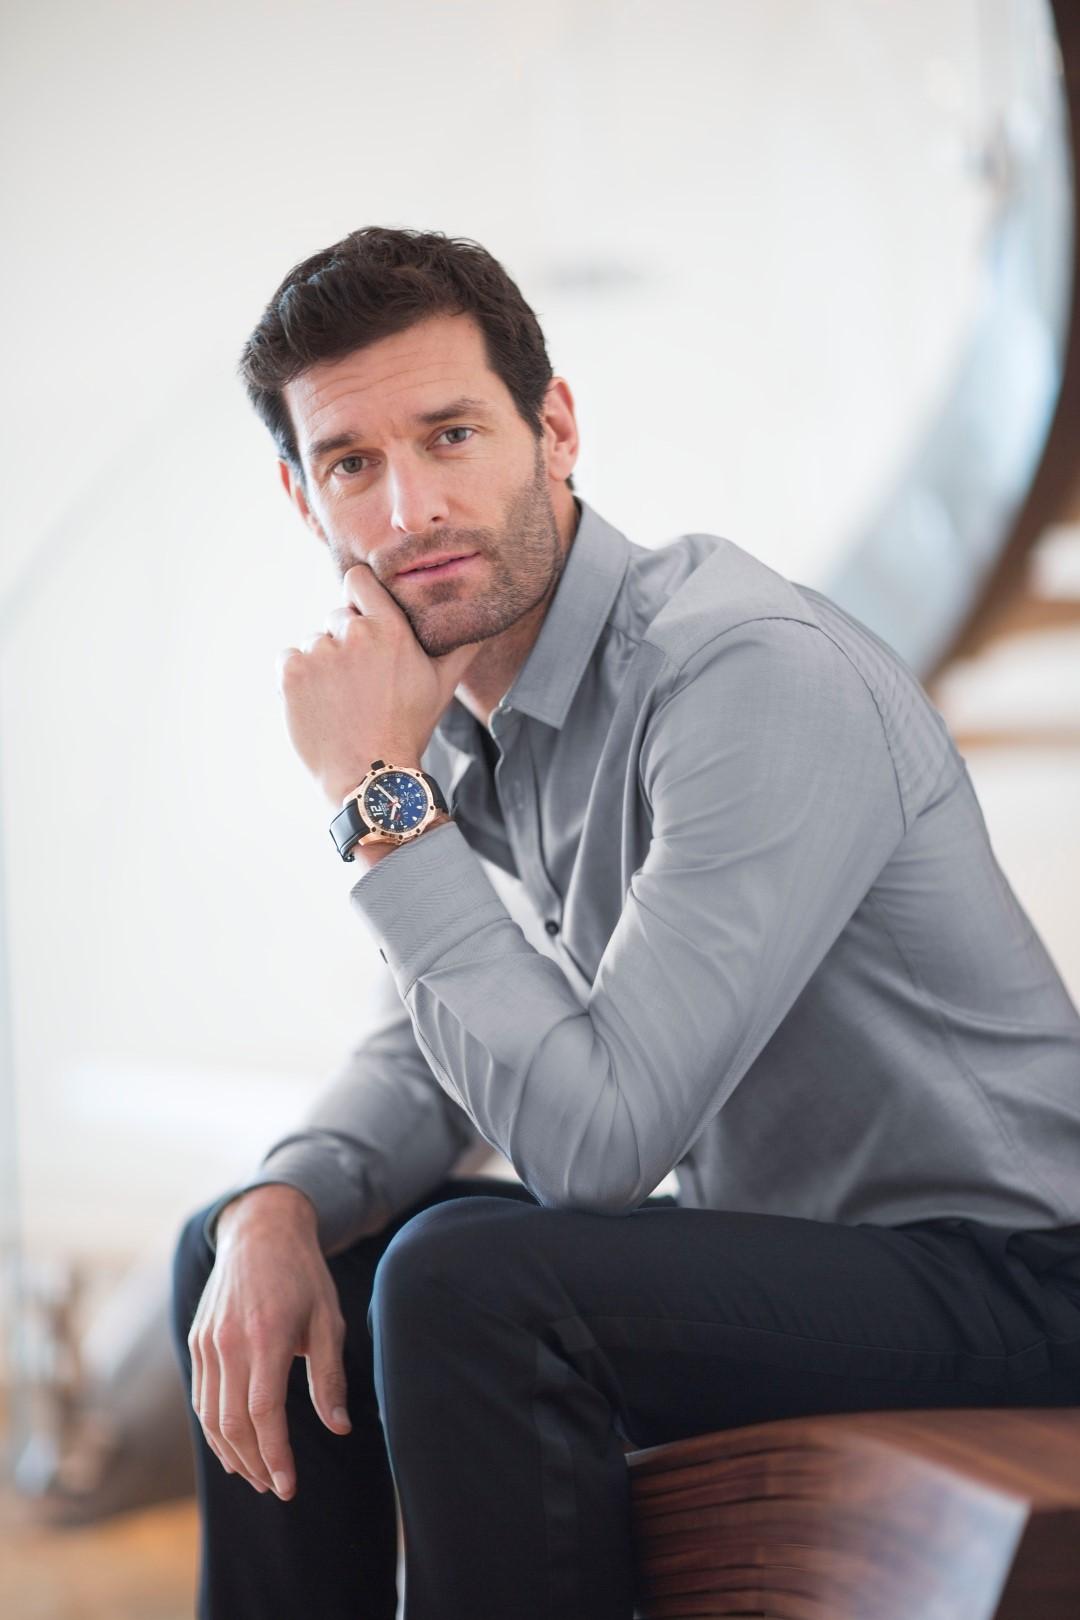 Mark Webber llevando el Superfast Chrono en oro rosa®JohannSauty-Chopard